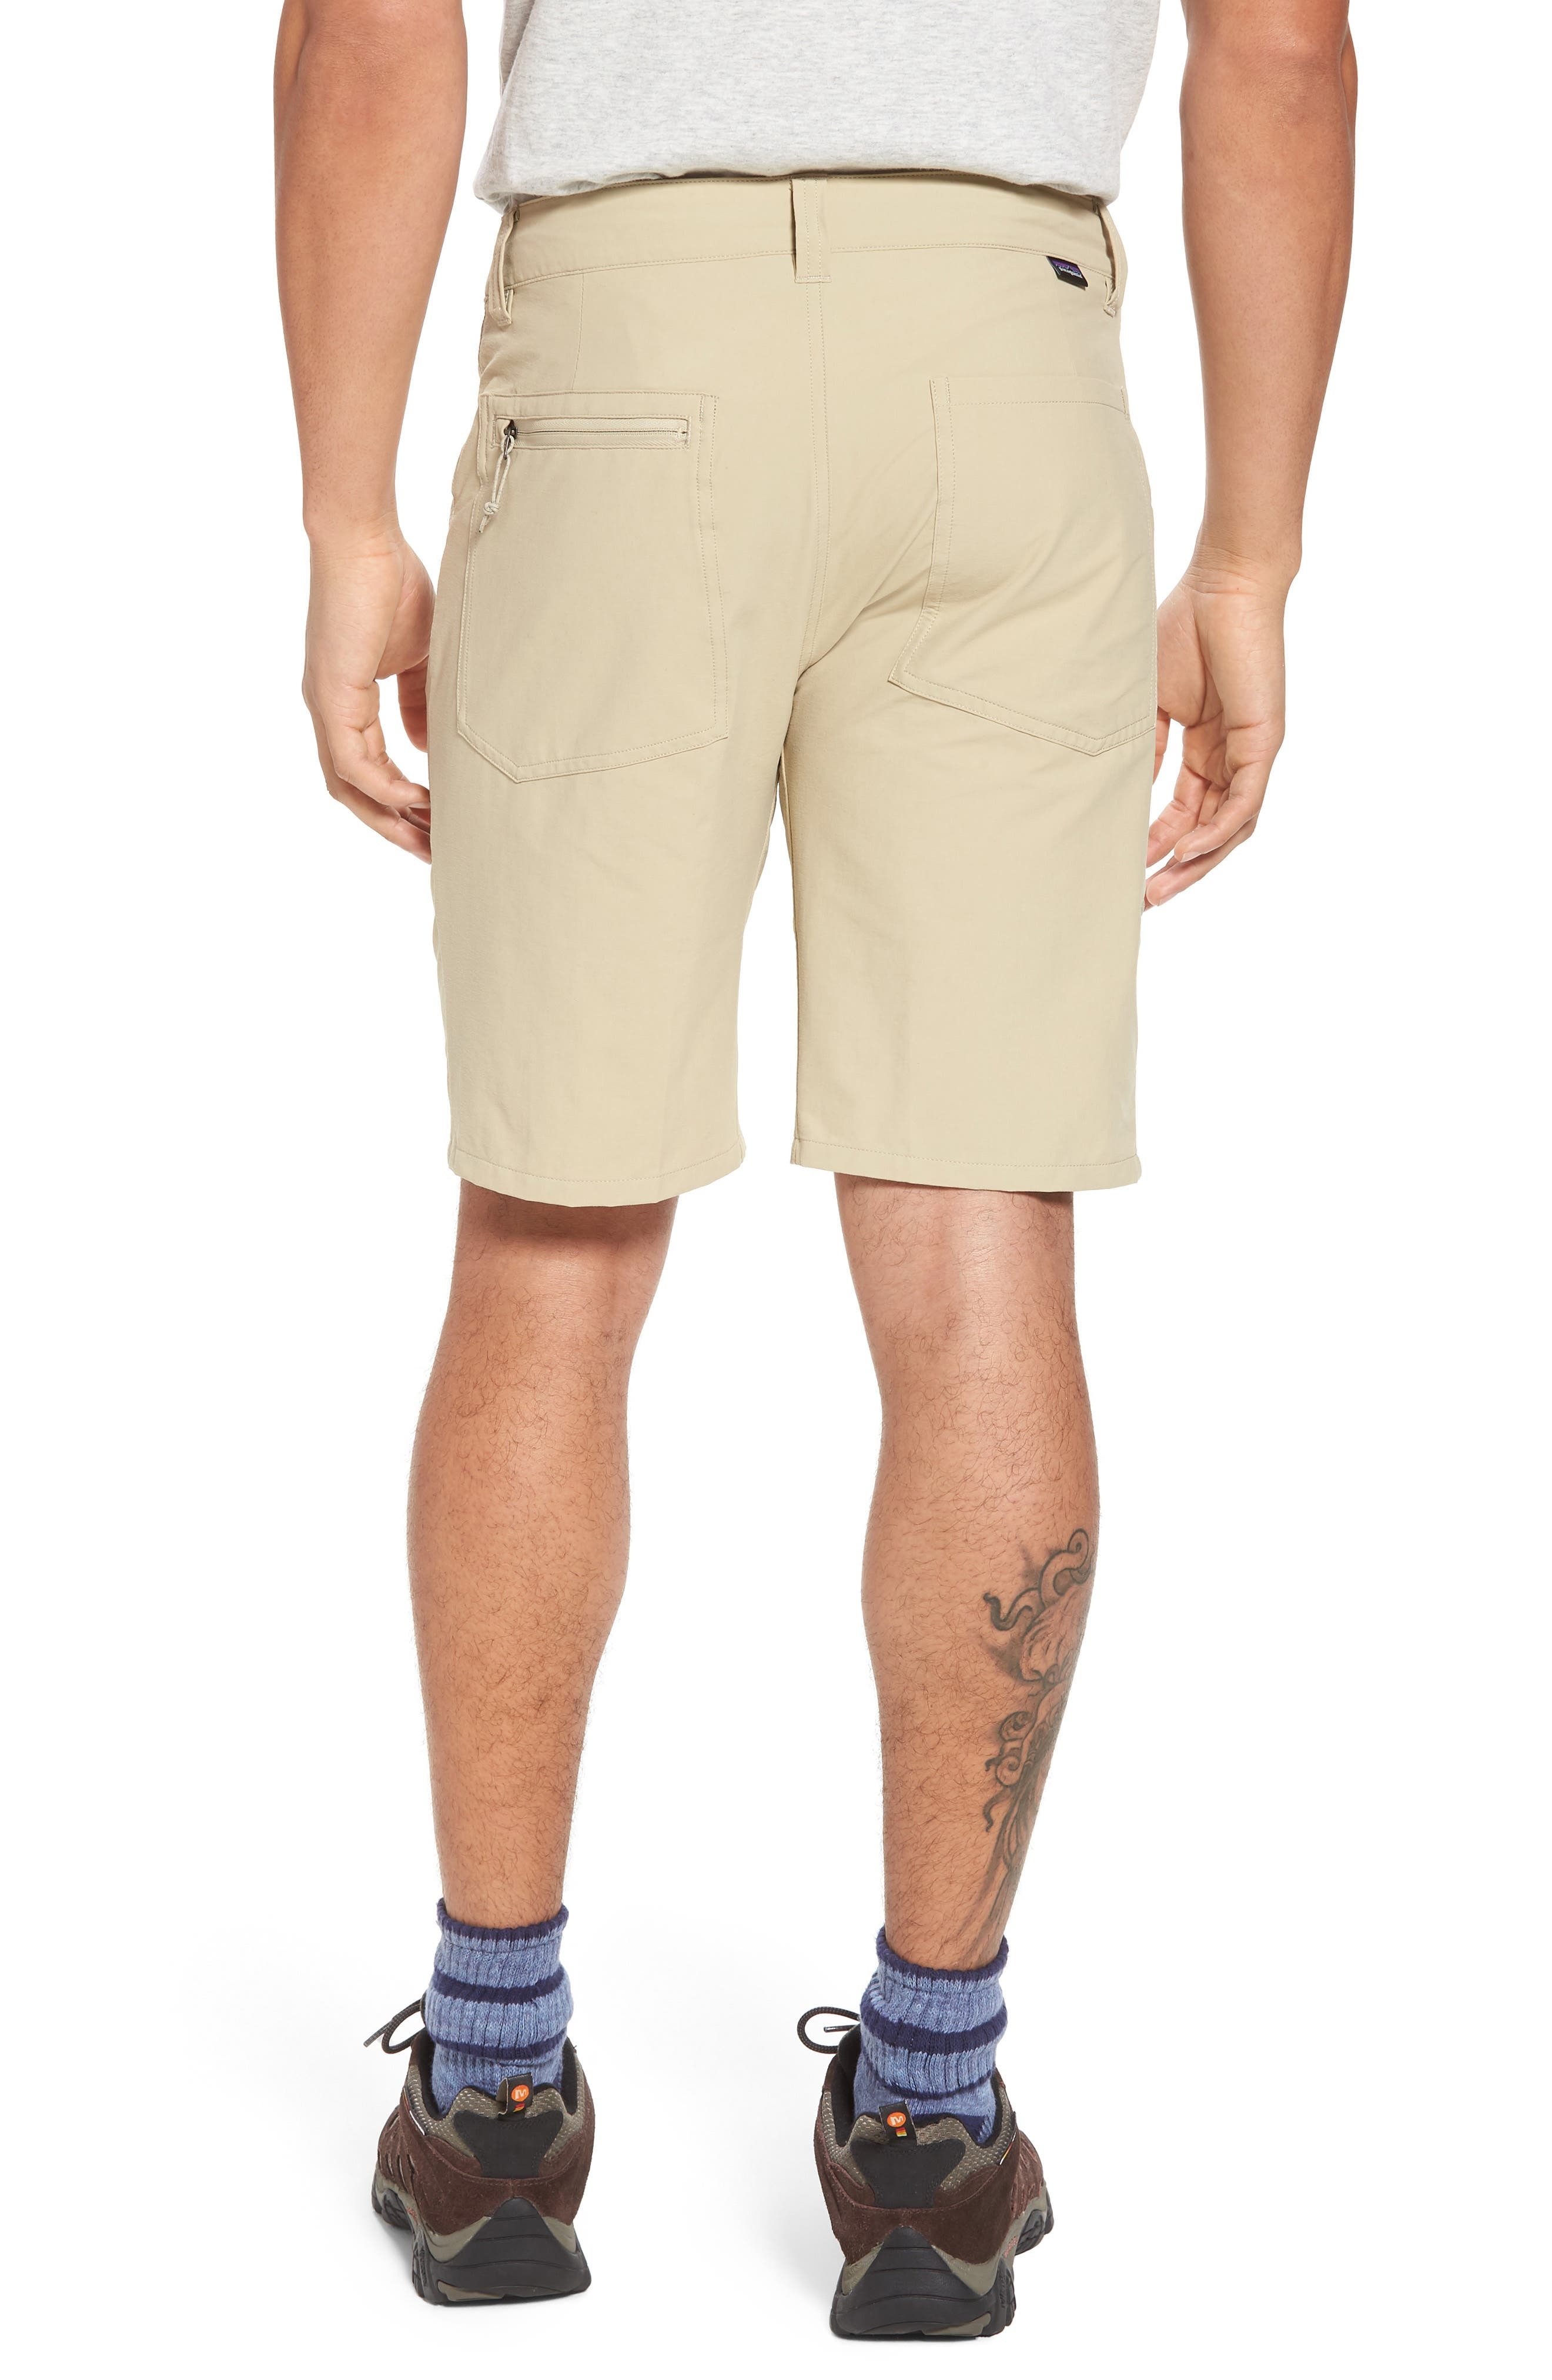 Quandary Shorts,                             Alternate thumbnail 2, color,                             EL CAP KHAKI